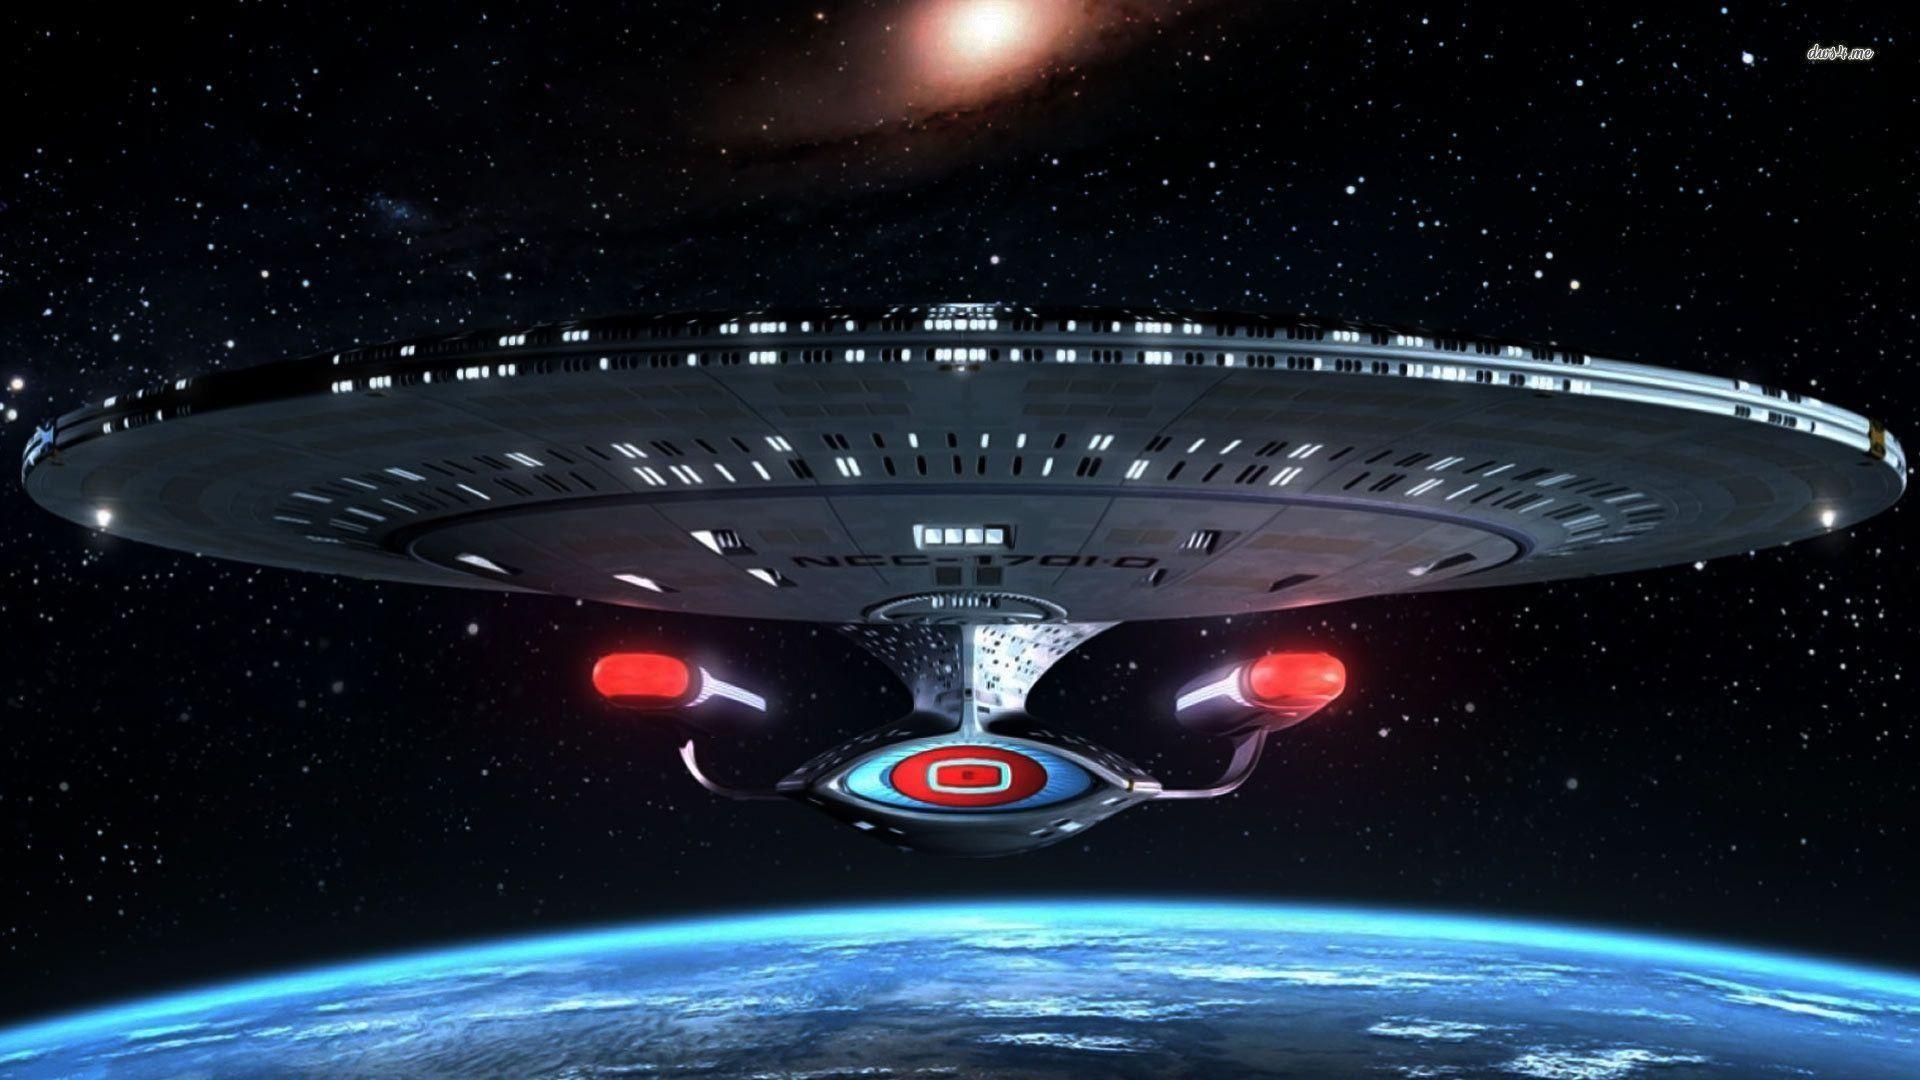 Star Trek Into Darkness Enterprise Wallpaper Hd Desktop 10 HD .